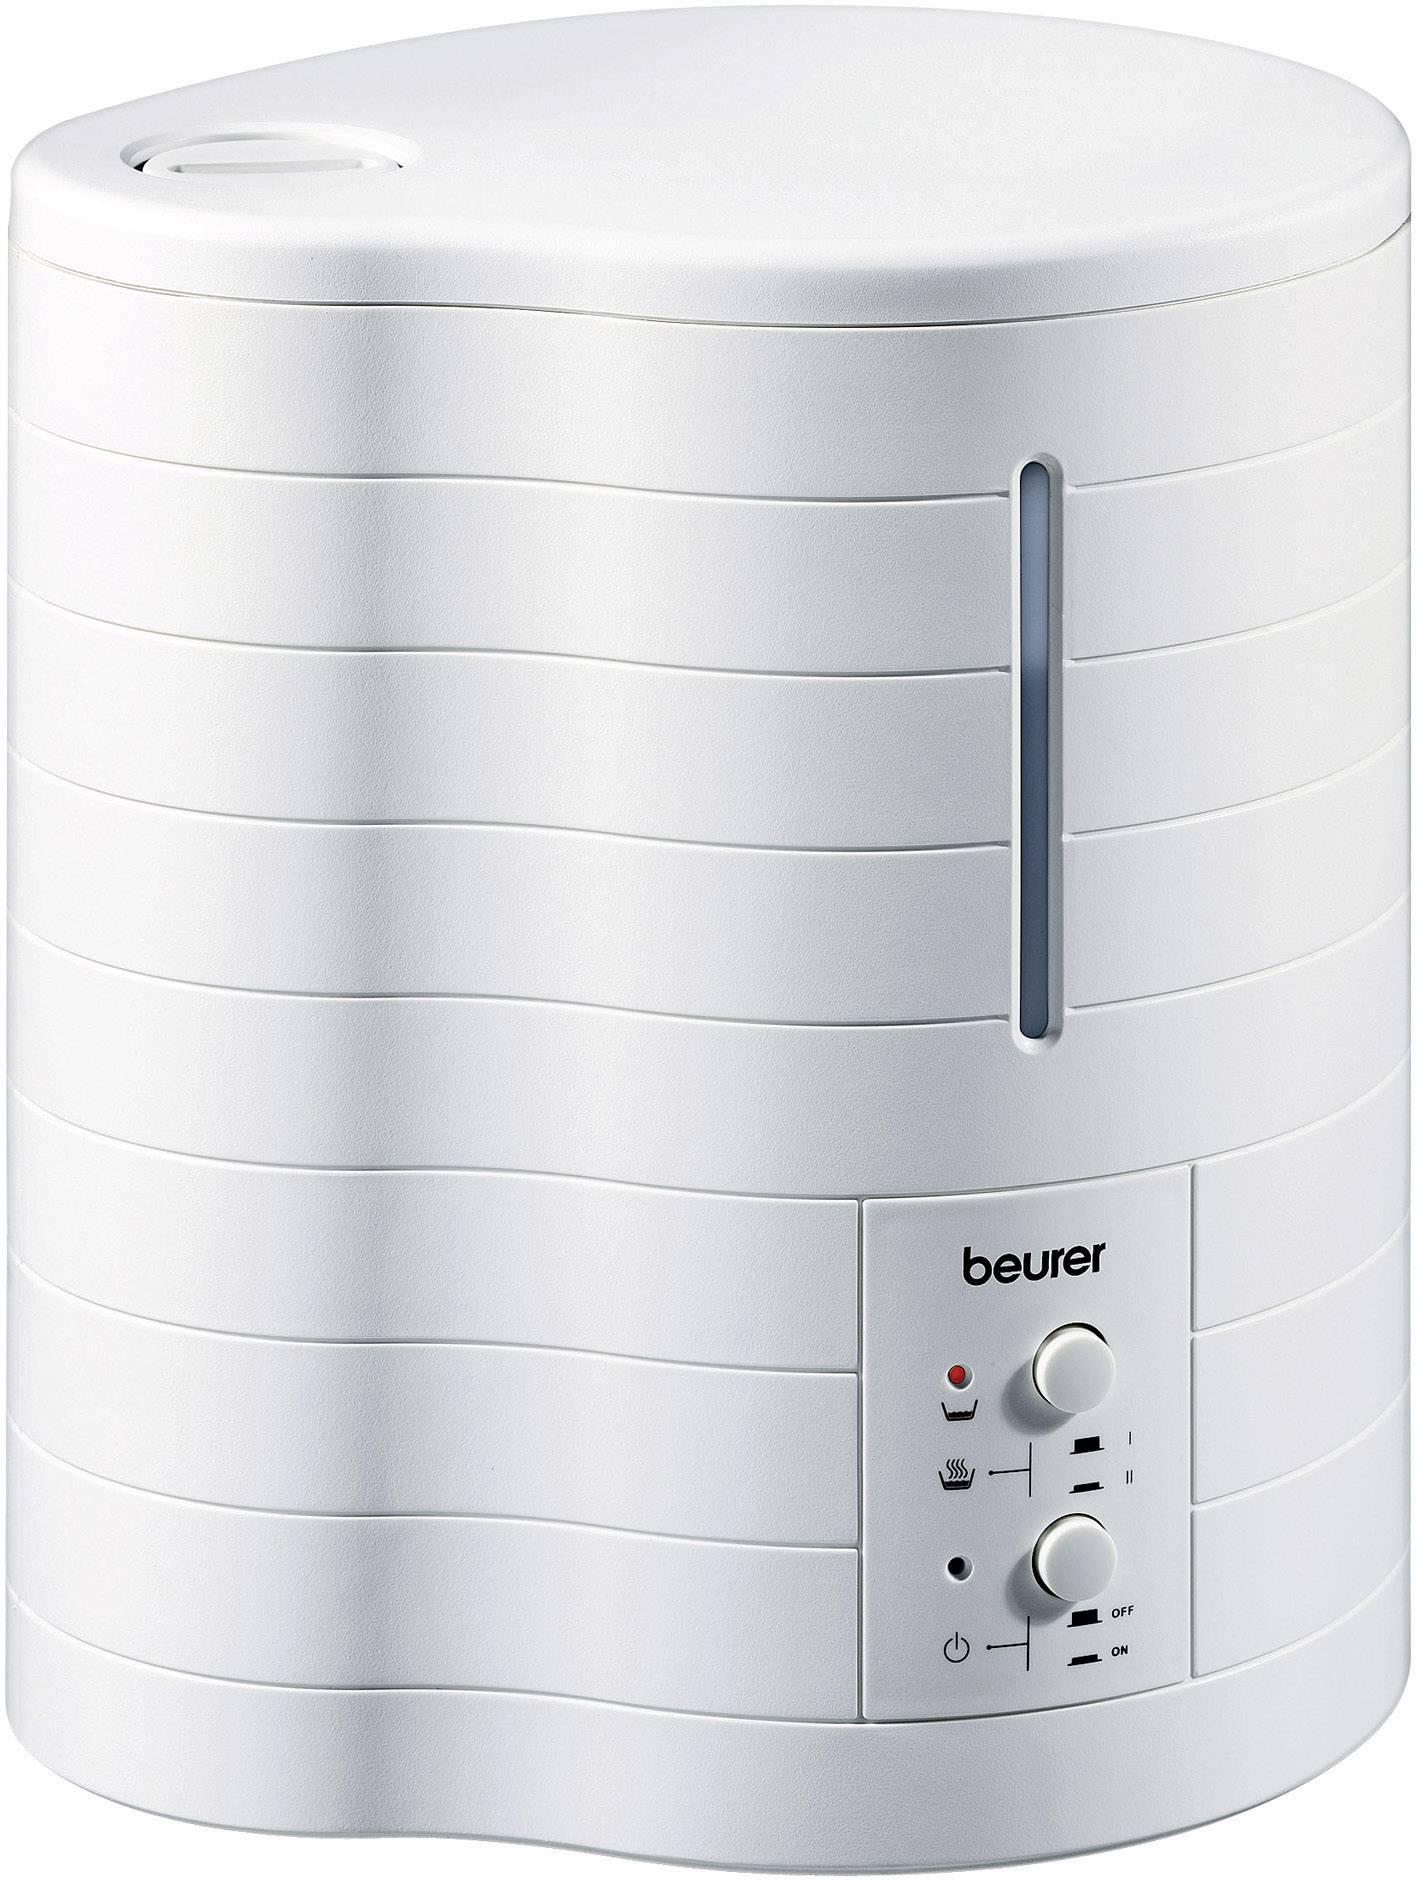 Zvlhčovač vzduchu Beurer LB 50